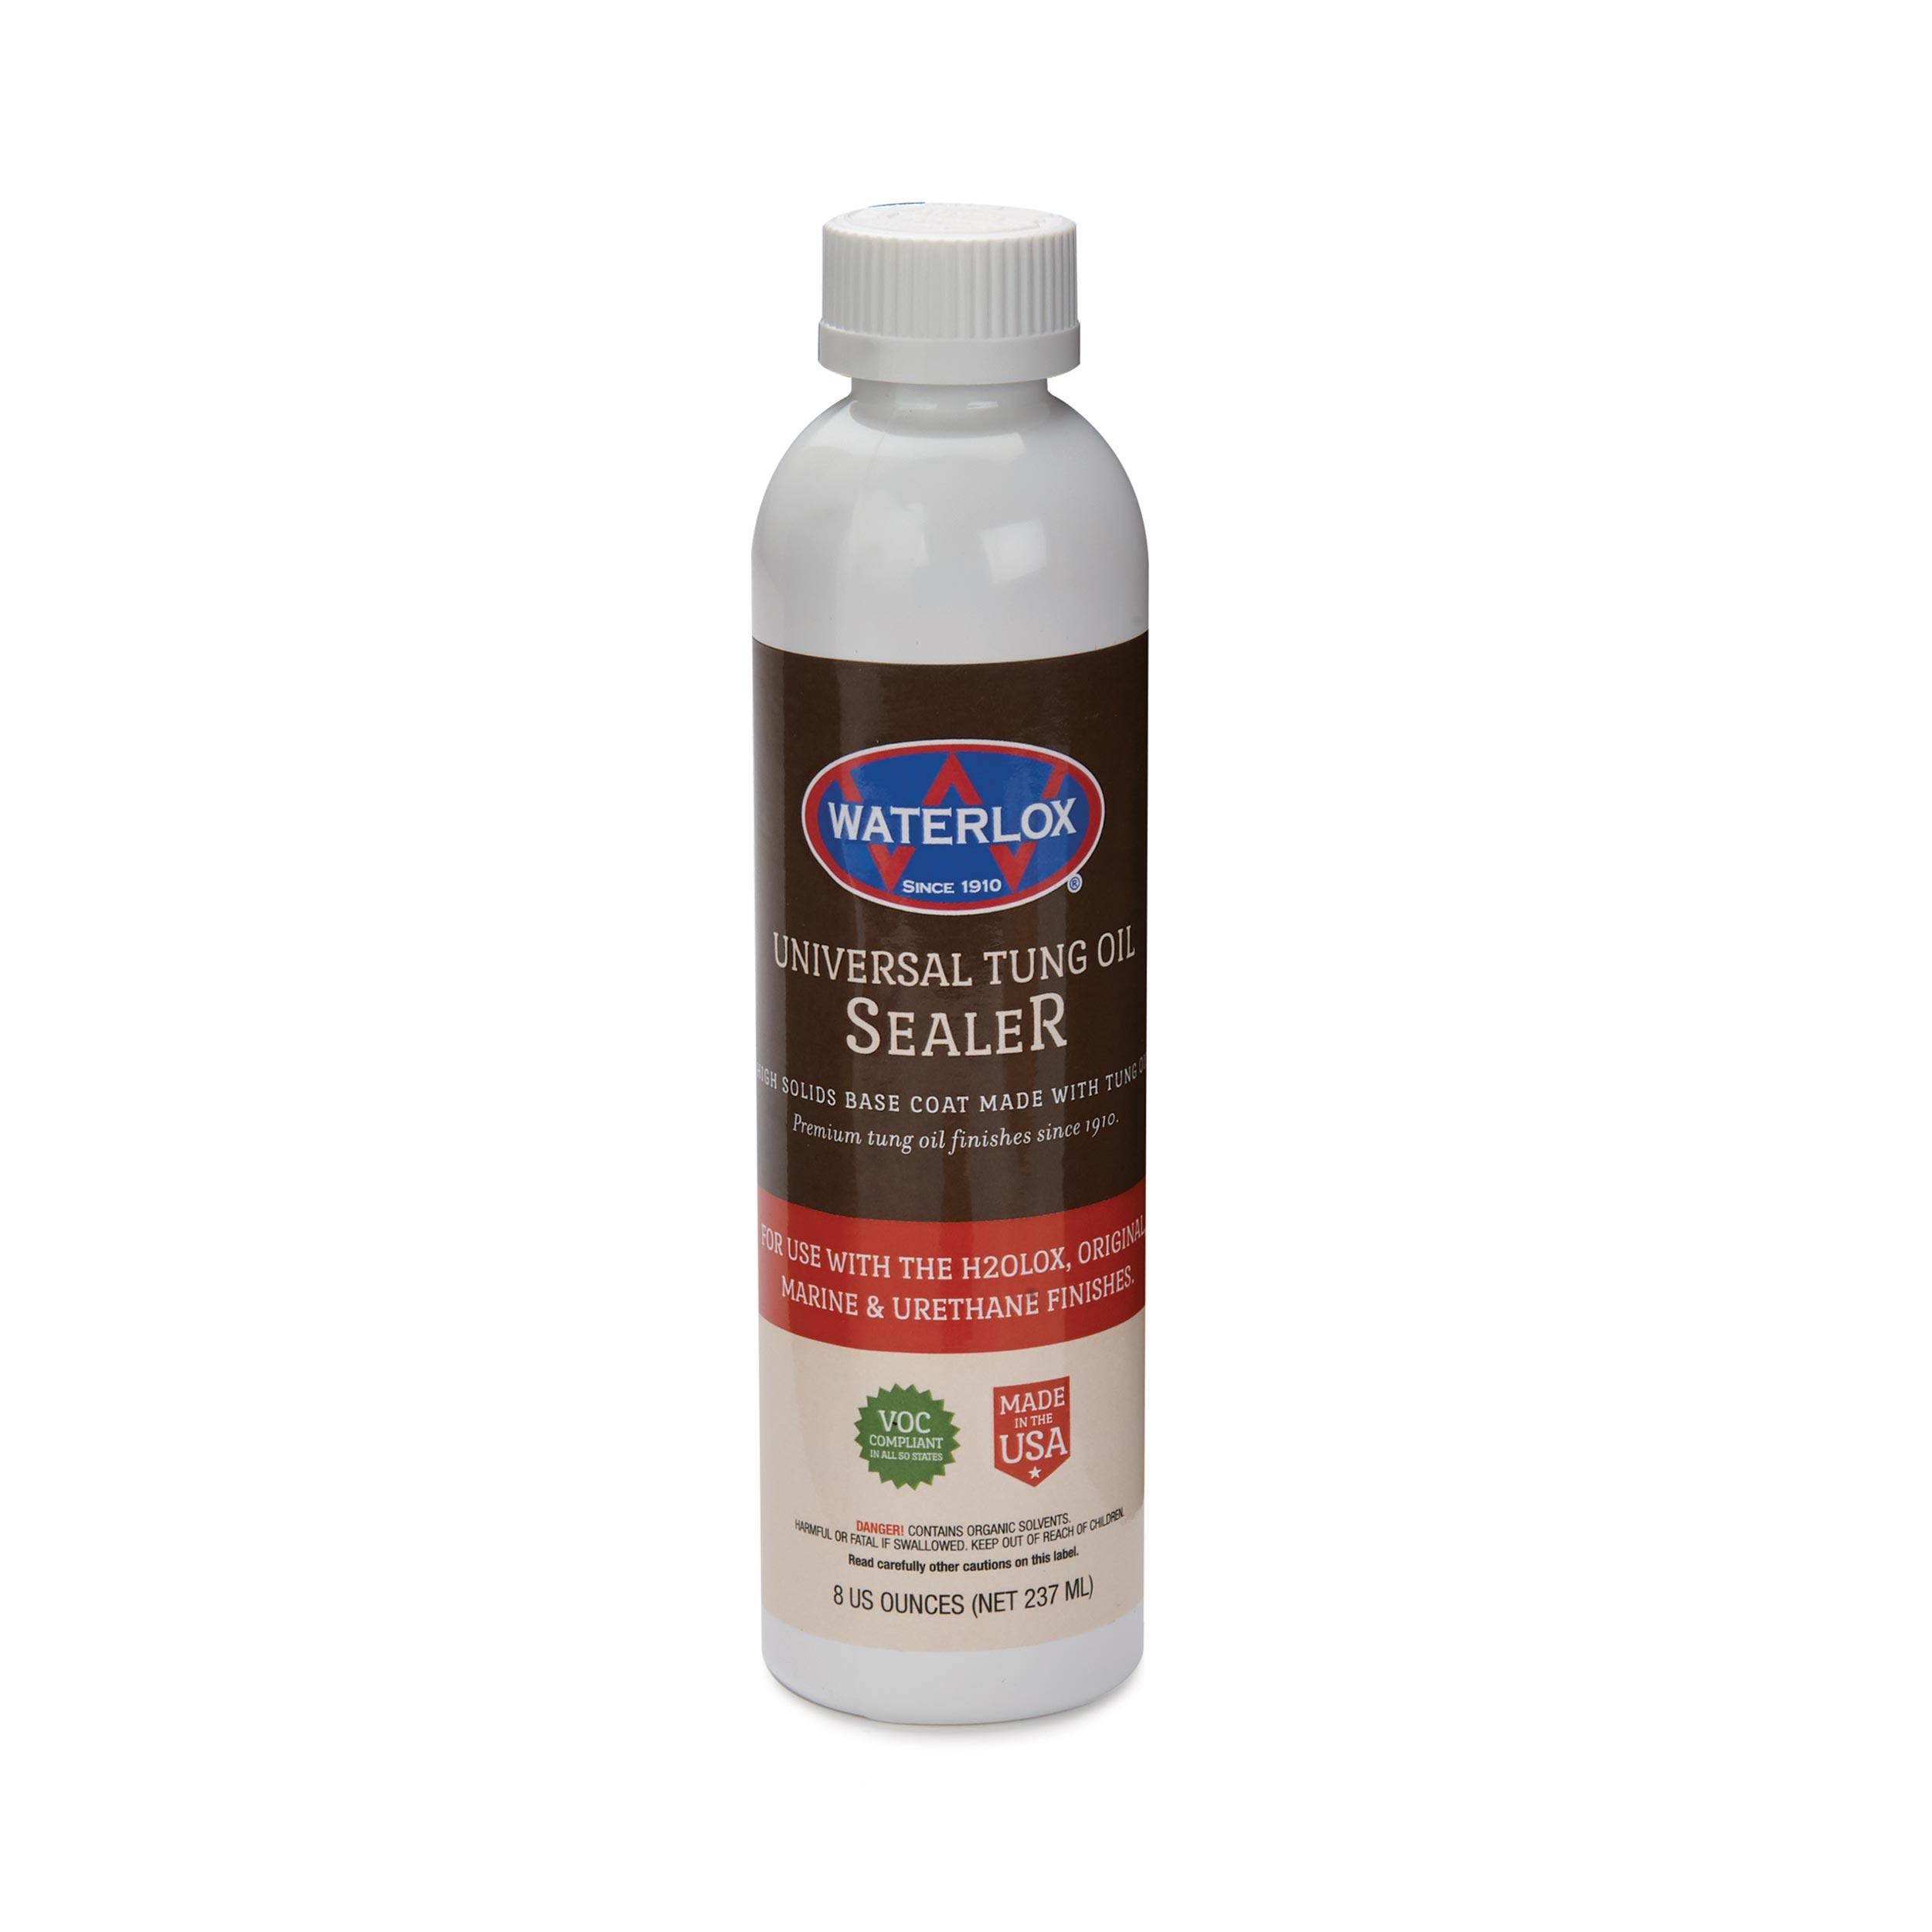 Universal Tung Oil Sealer 1/2Pt